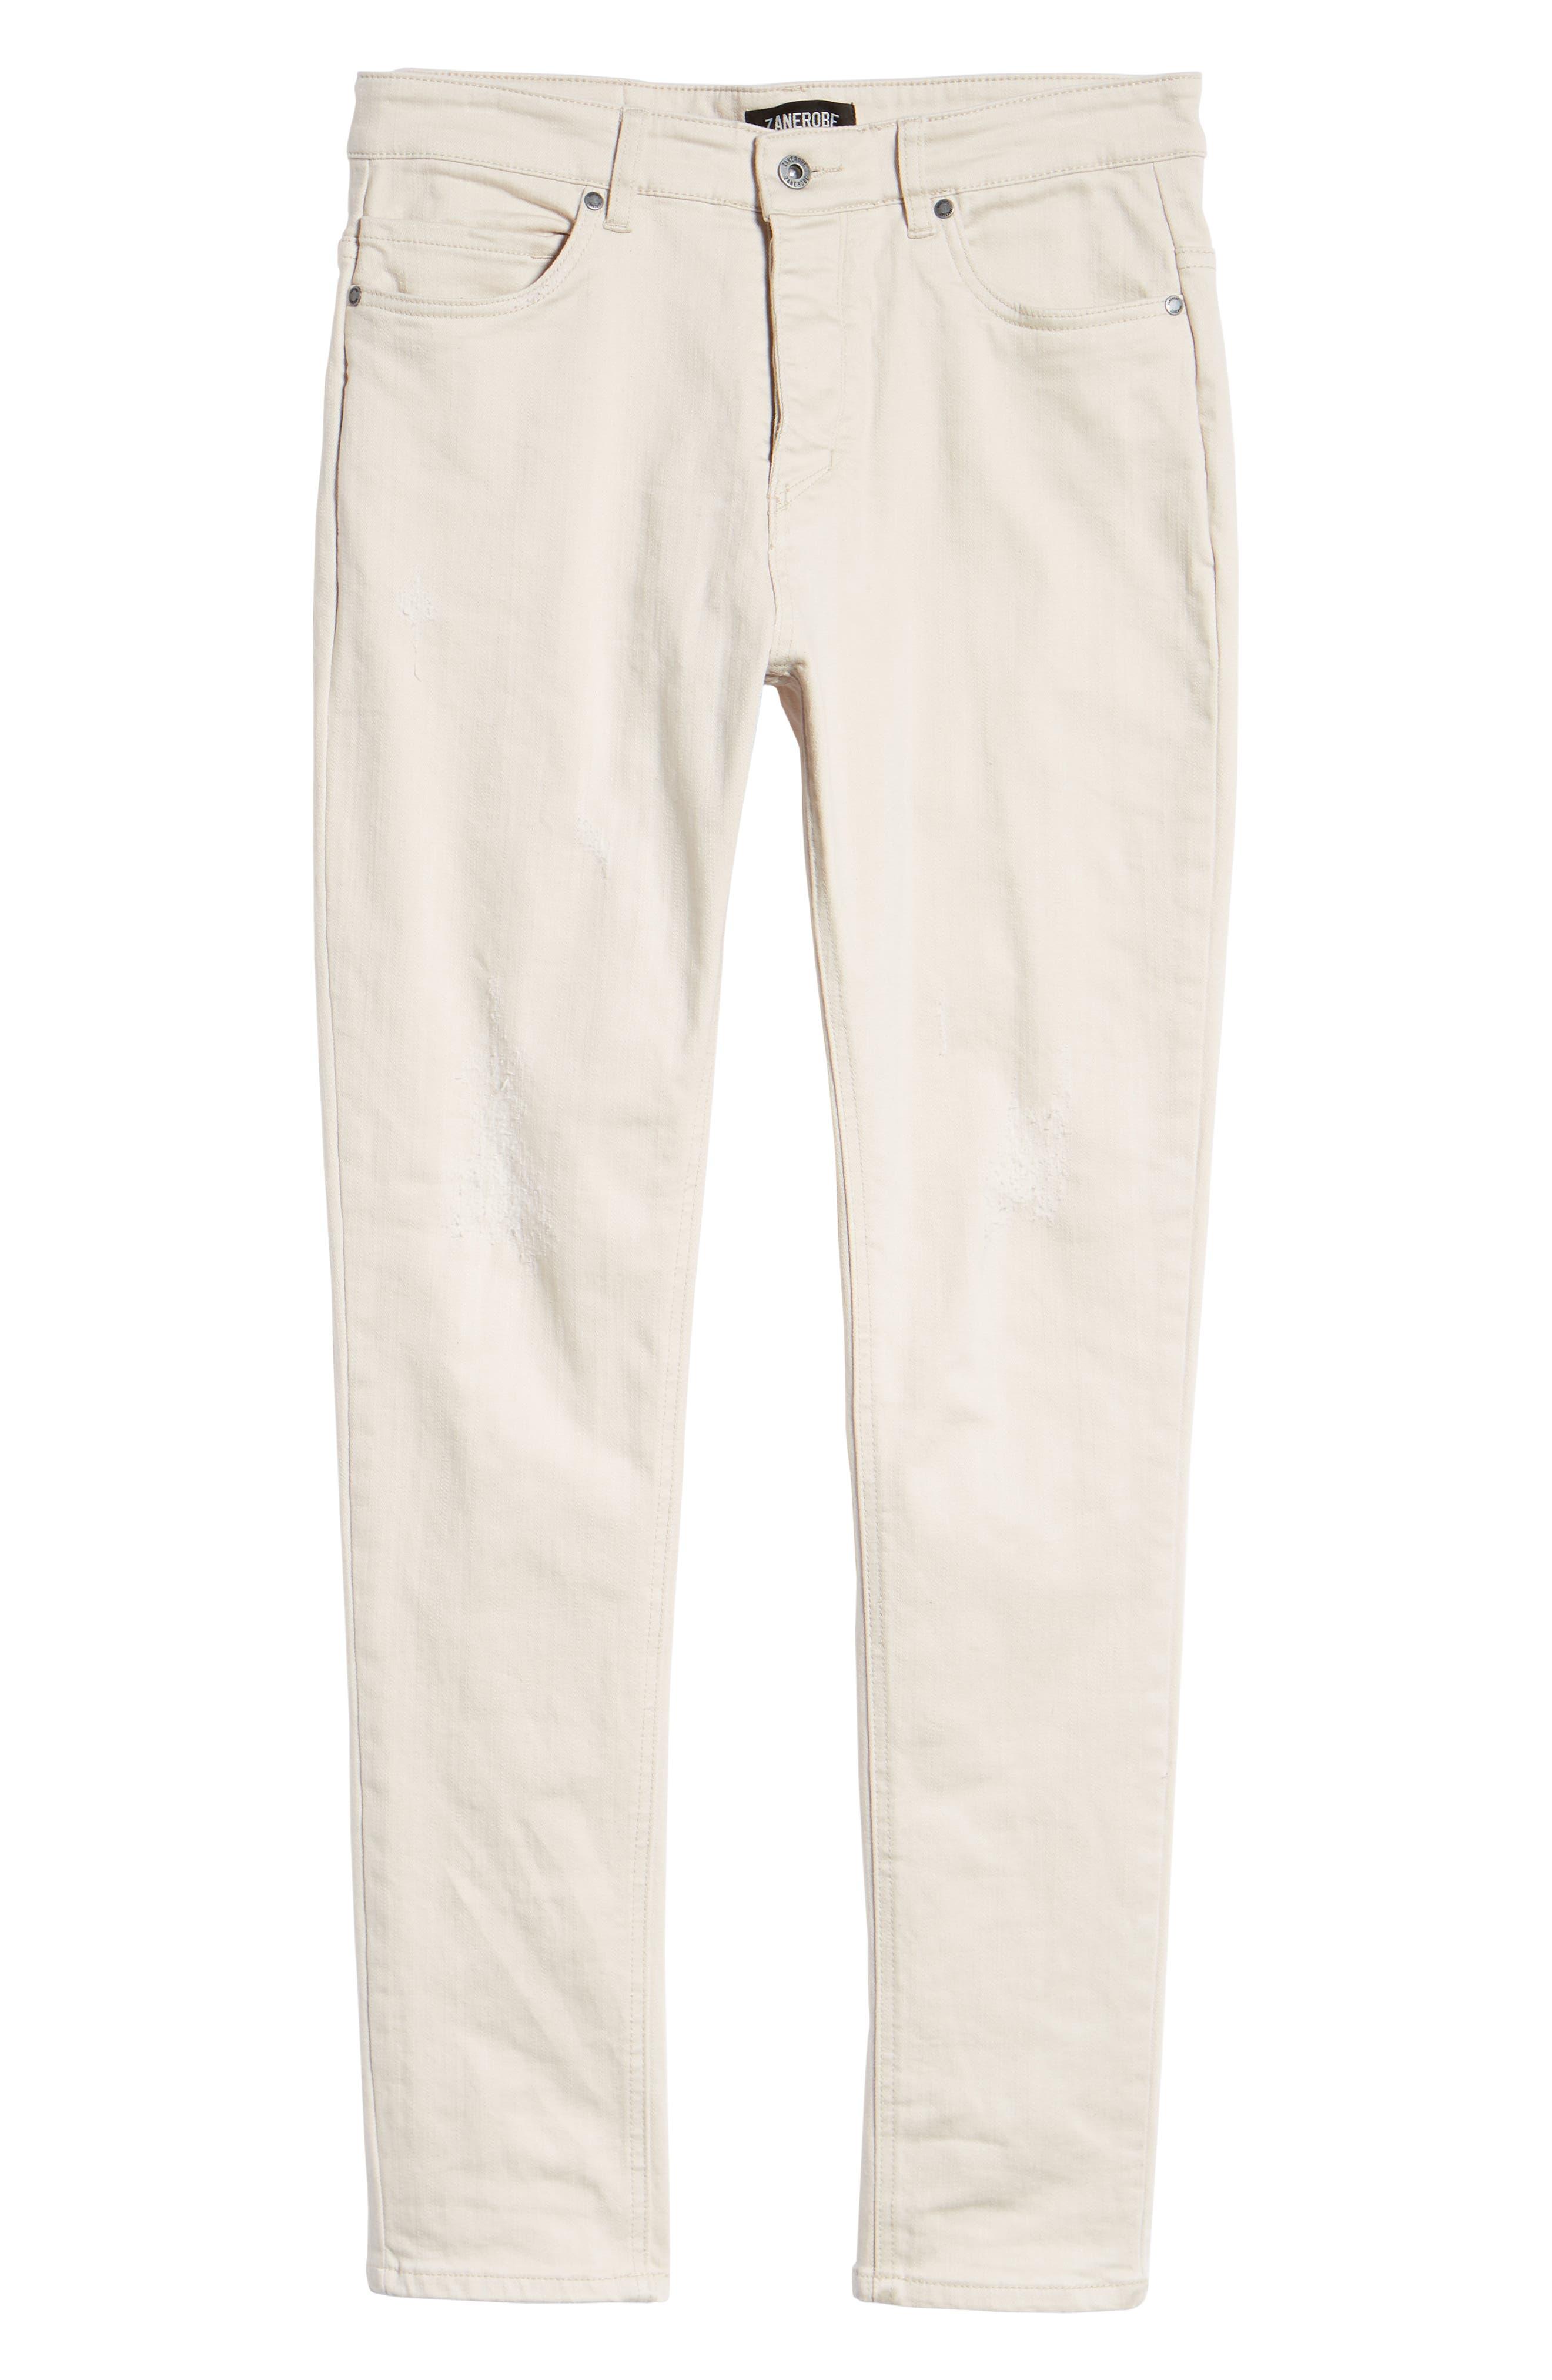 Joe Blow Slim Fit Jeans,                             Alternate thumbnail 6, color,                             901